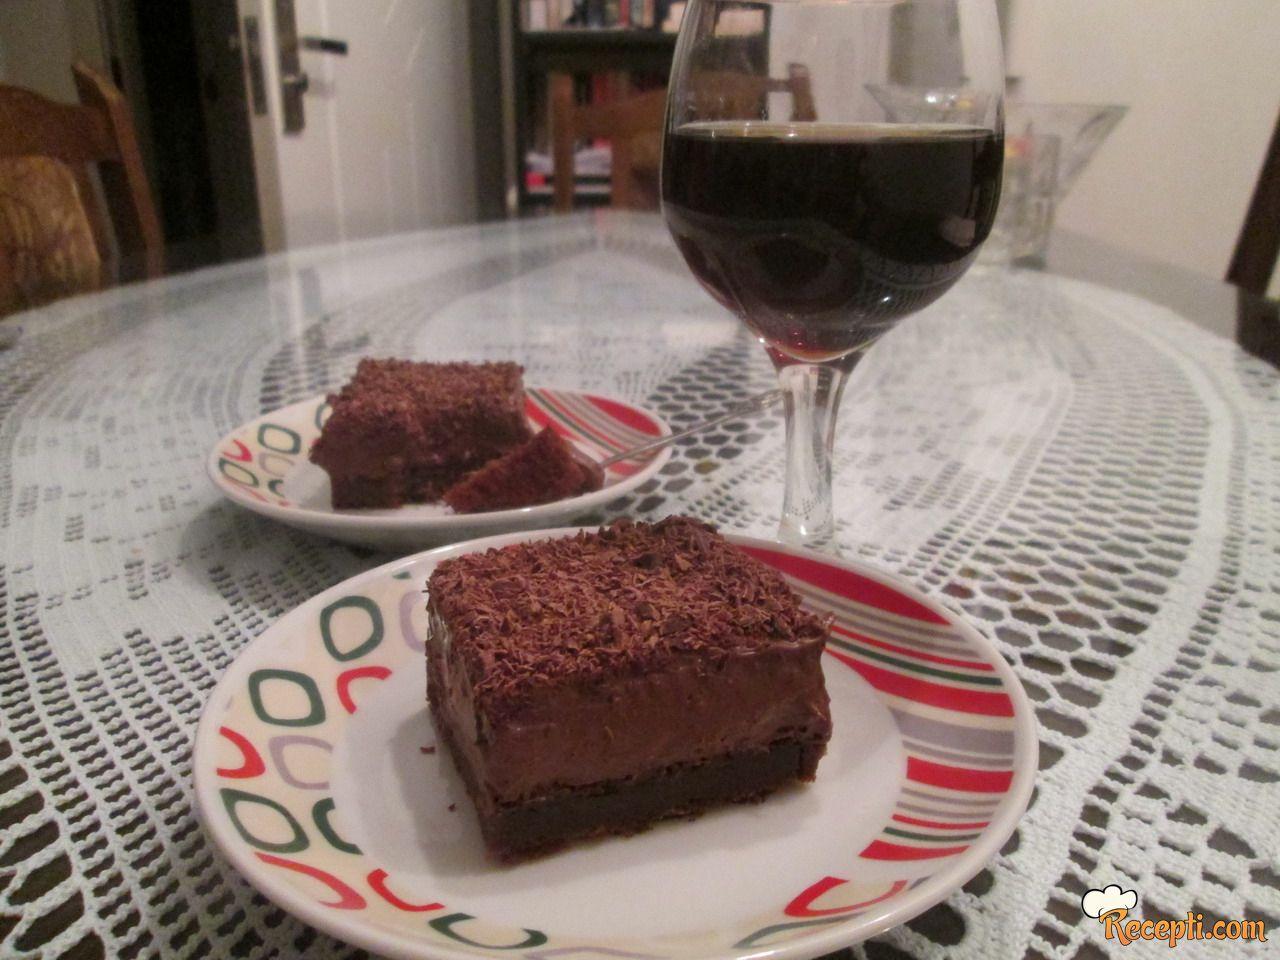 Čokoladne kocke (12)